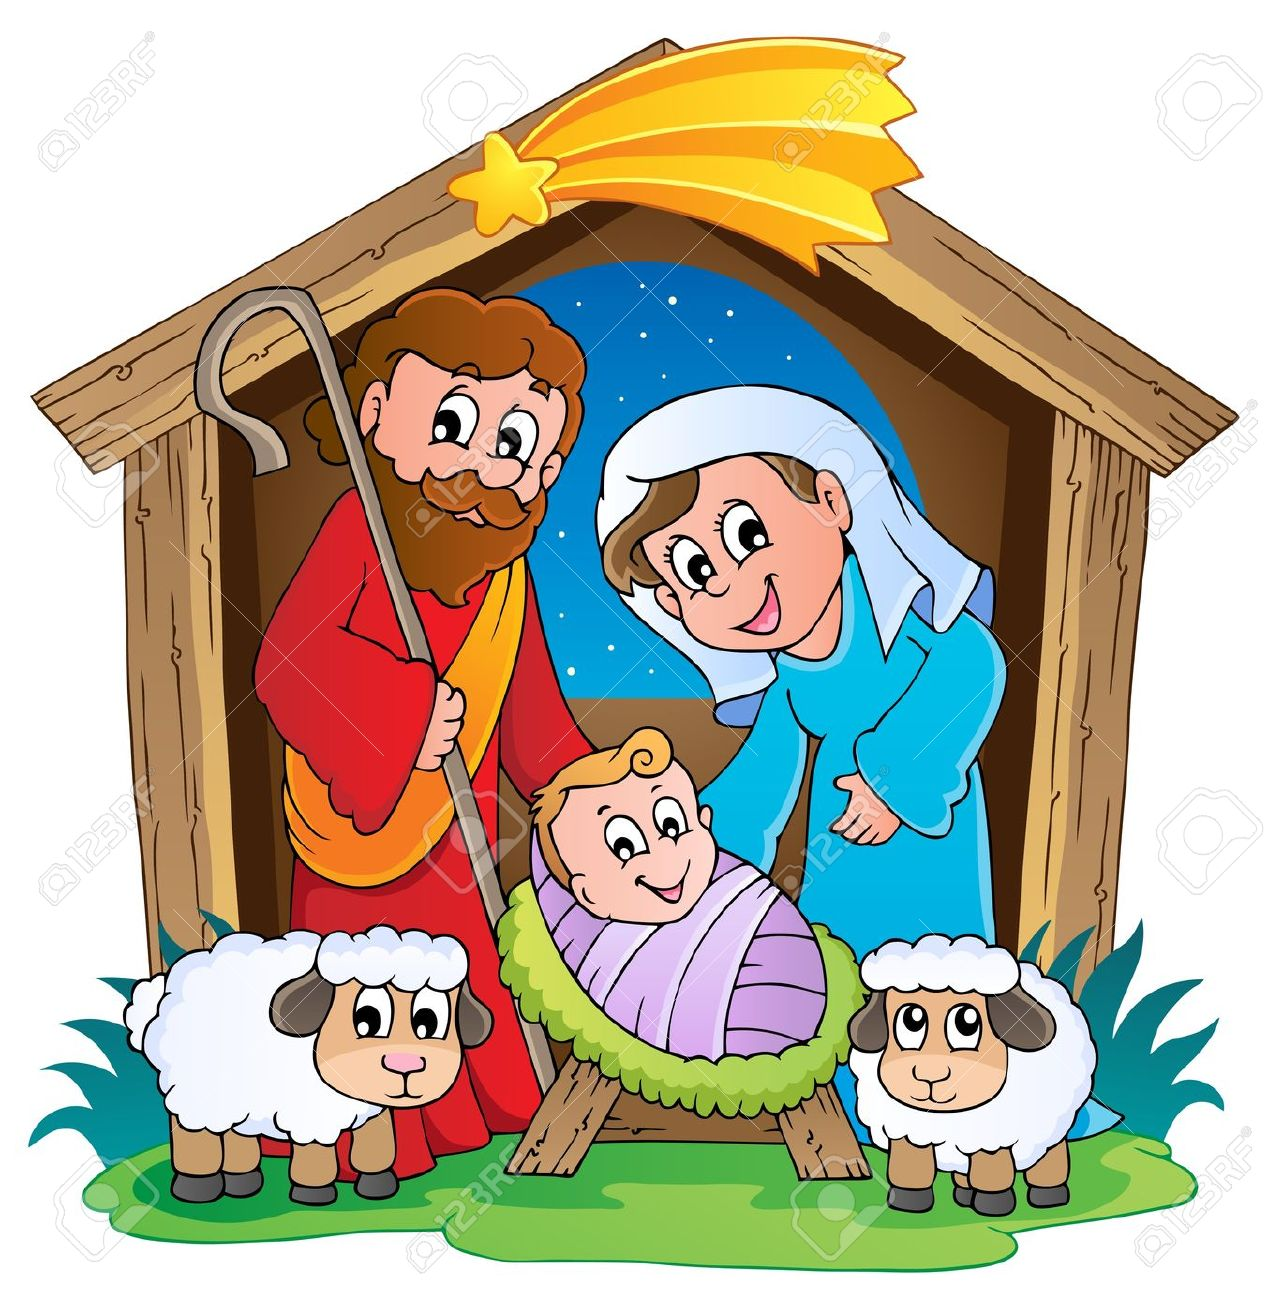 Christmas Nativity: Christmas Nativity S-christmas nativity: Christmas Nativity scene 2 Illustration-7